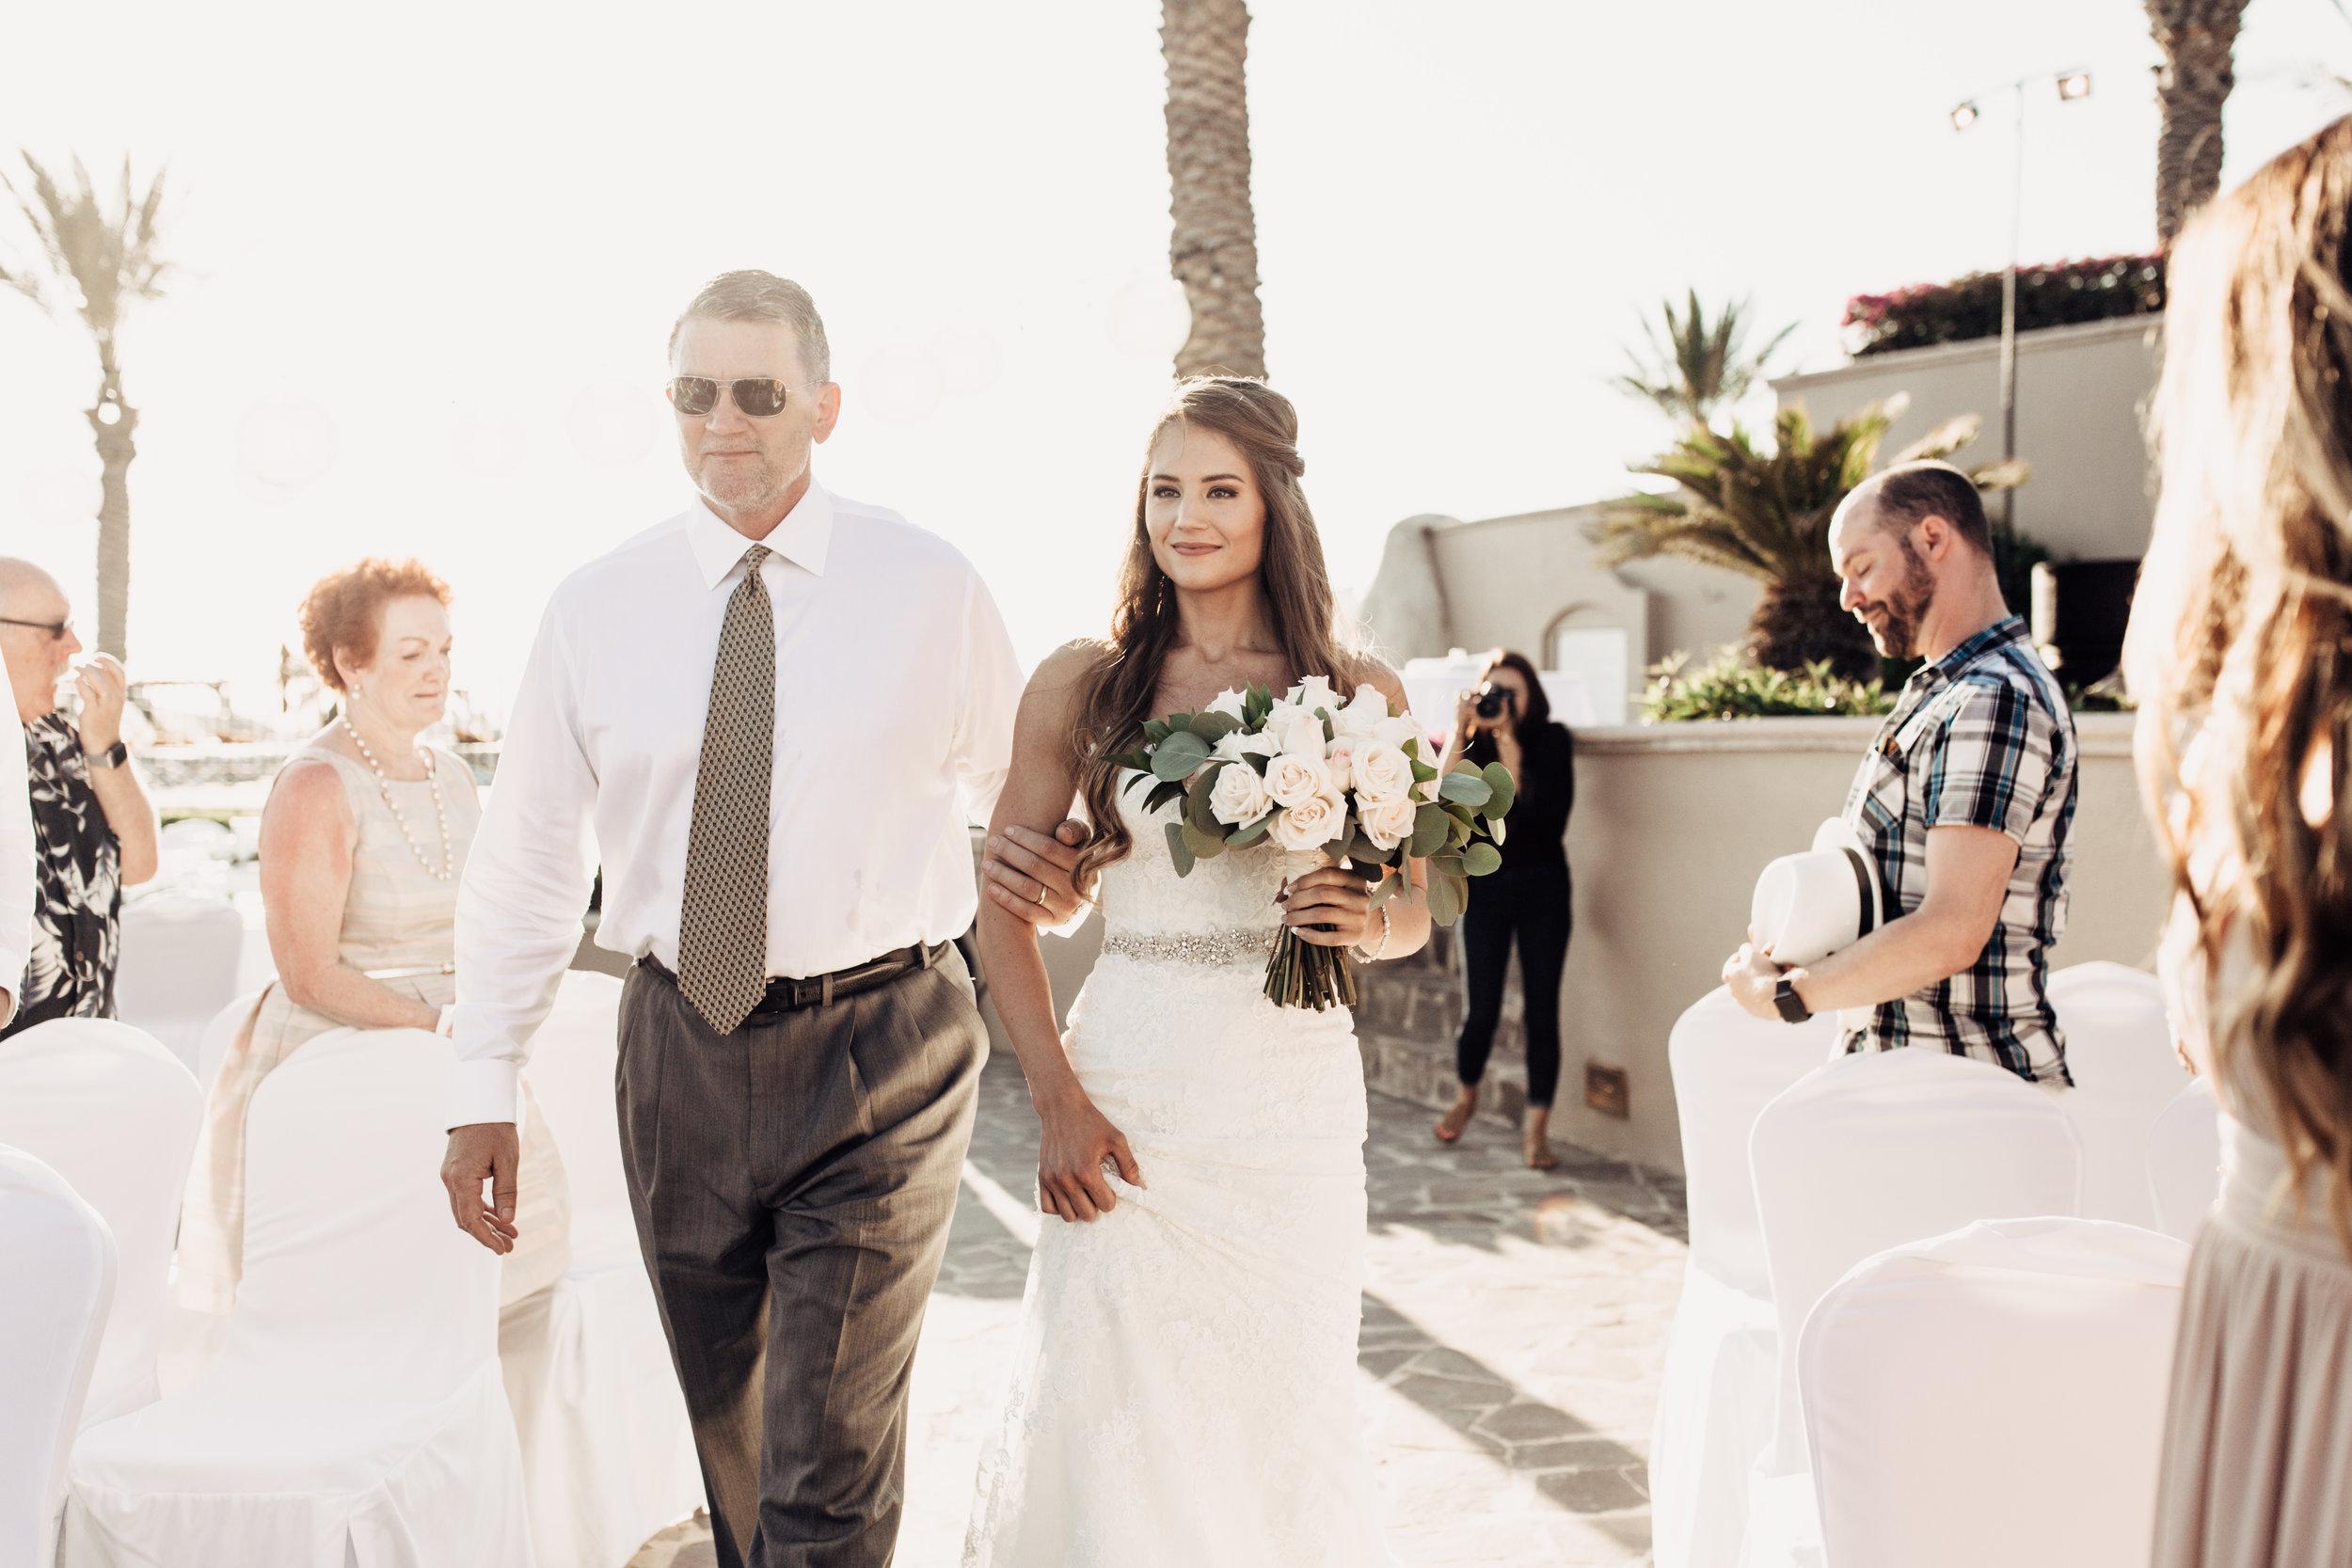 pueblo-bonito-sunset-beach-wedding-cabo-san-lucas298.jpg